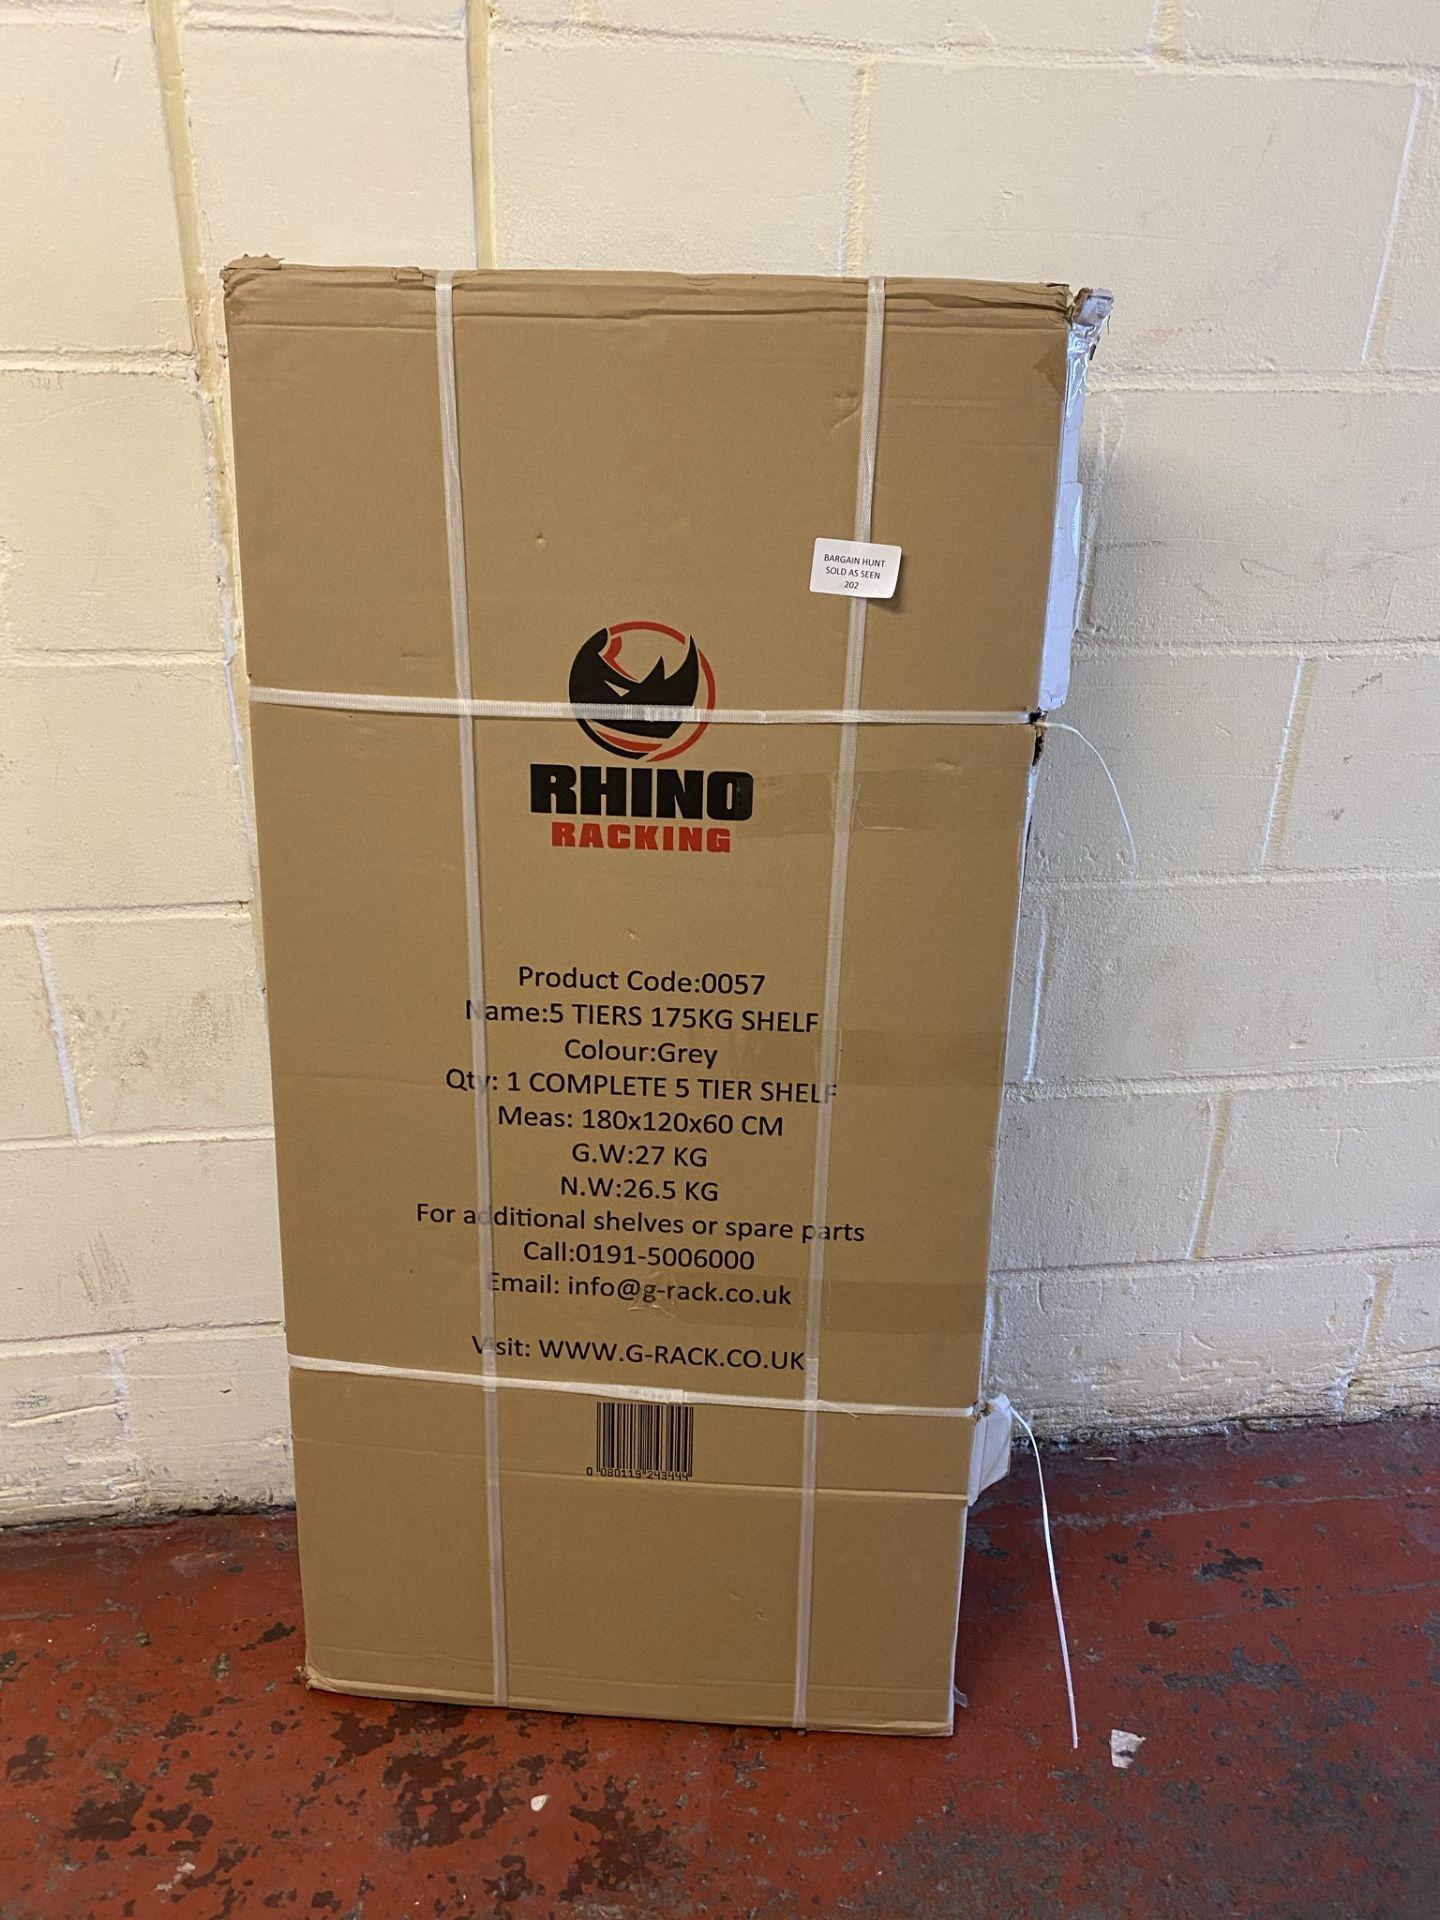 Rhino Racking Heavy Duty Stand Alone 5 Tier Industrial Shelving Unit